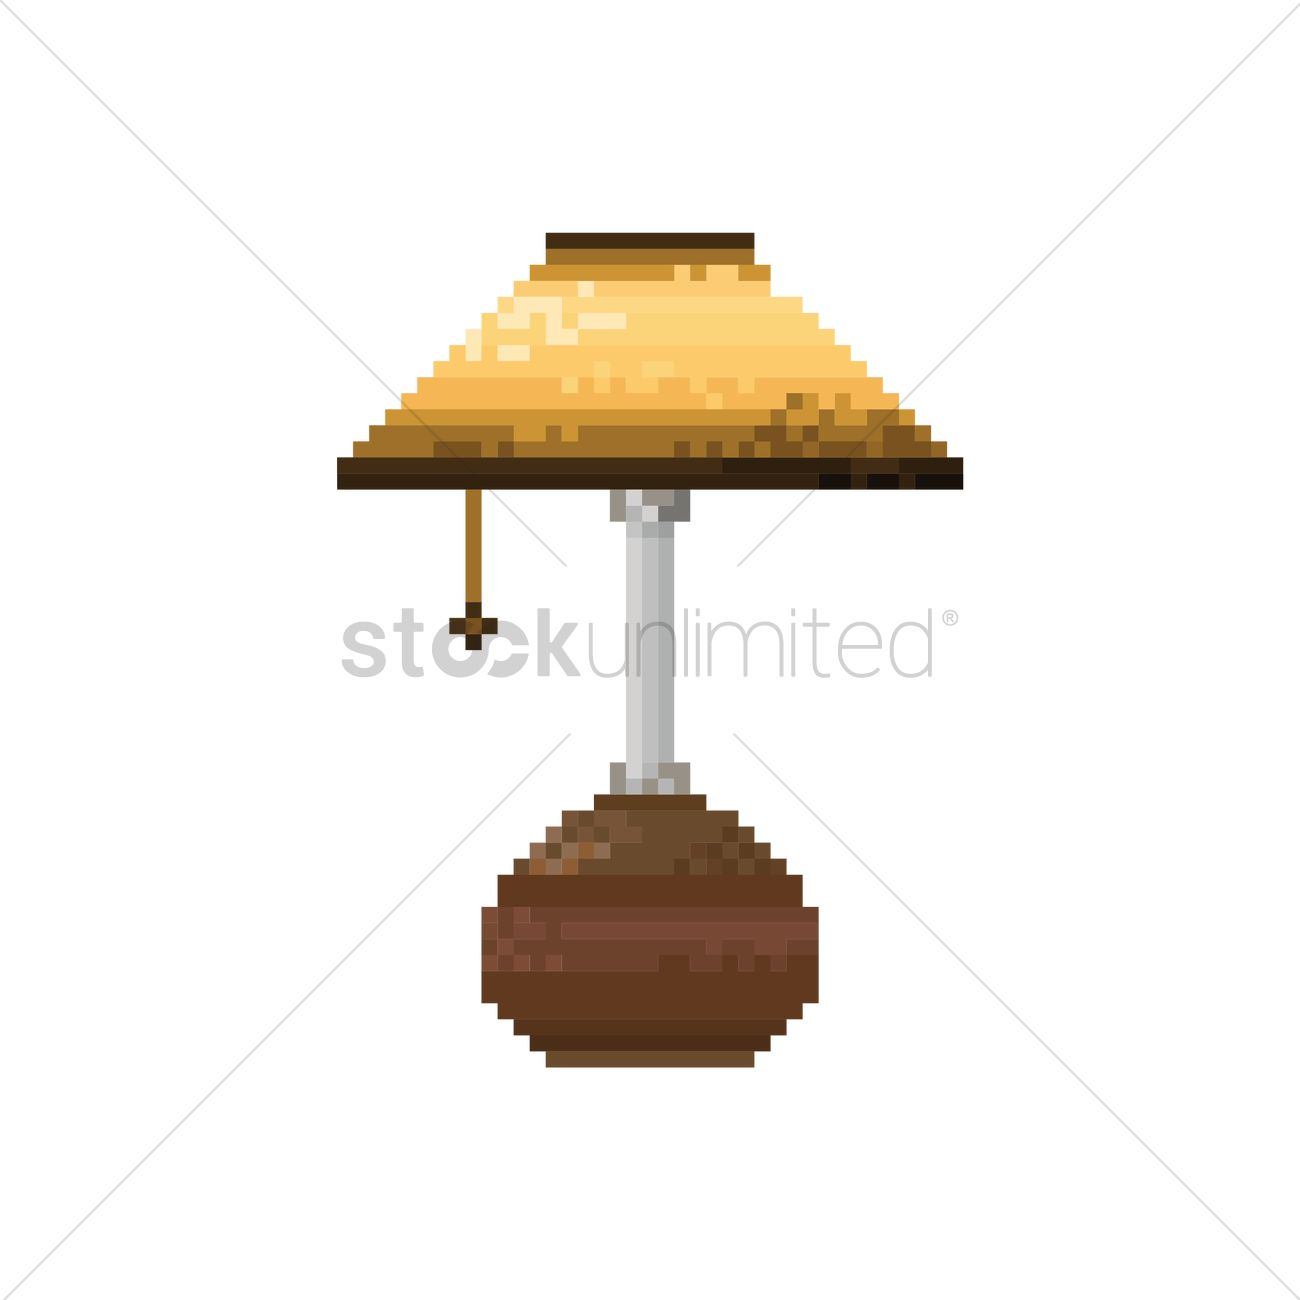 Pixel art table lamp vector image 1958432 stockunlimited pixel art table lamp vector graphic aloadofball Choice Image